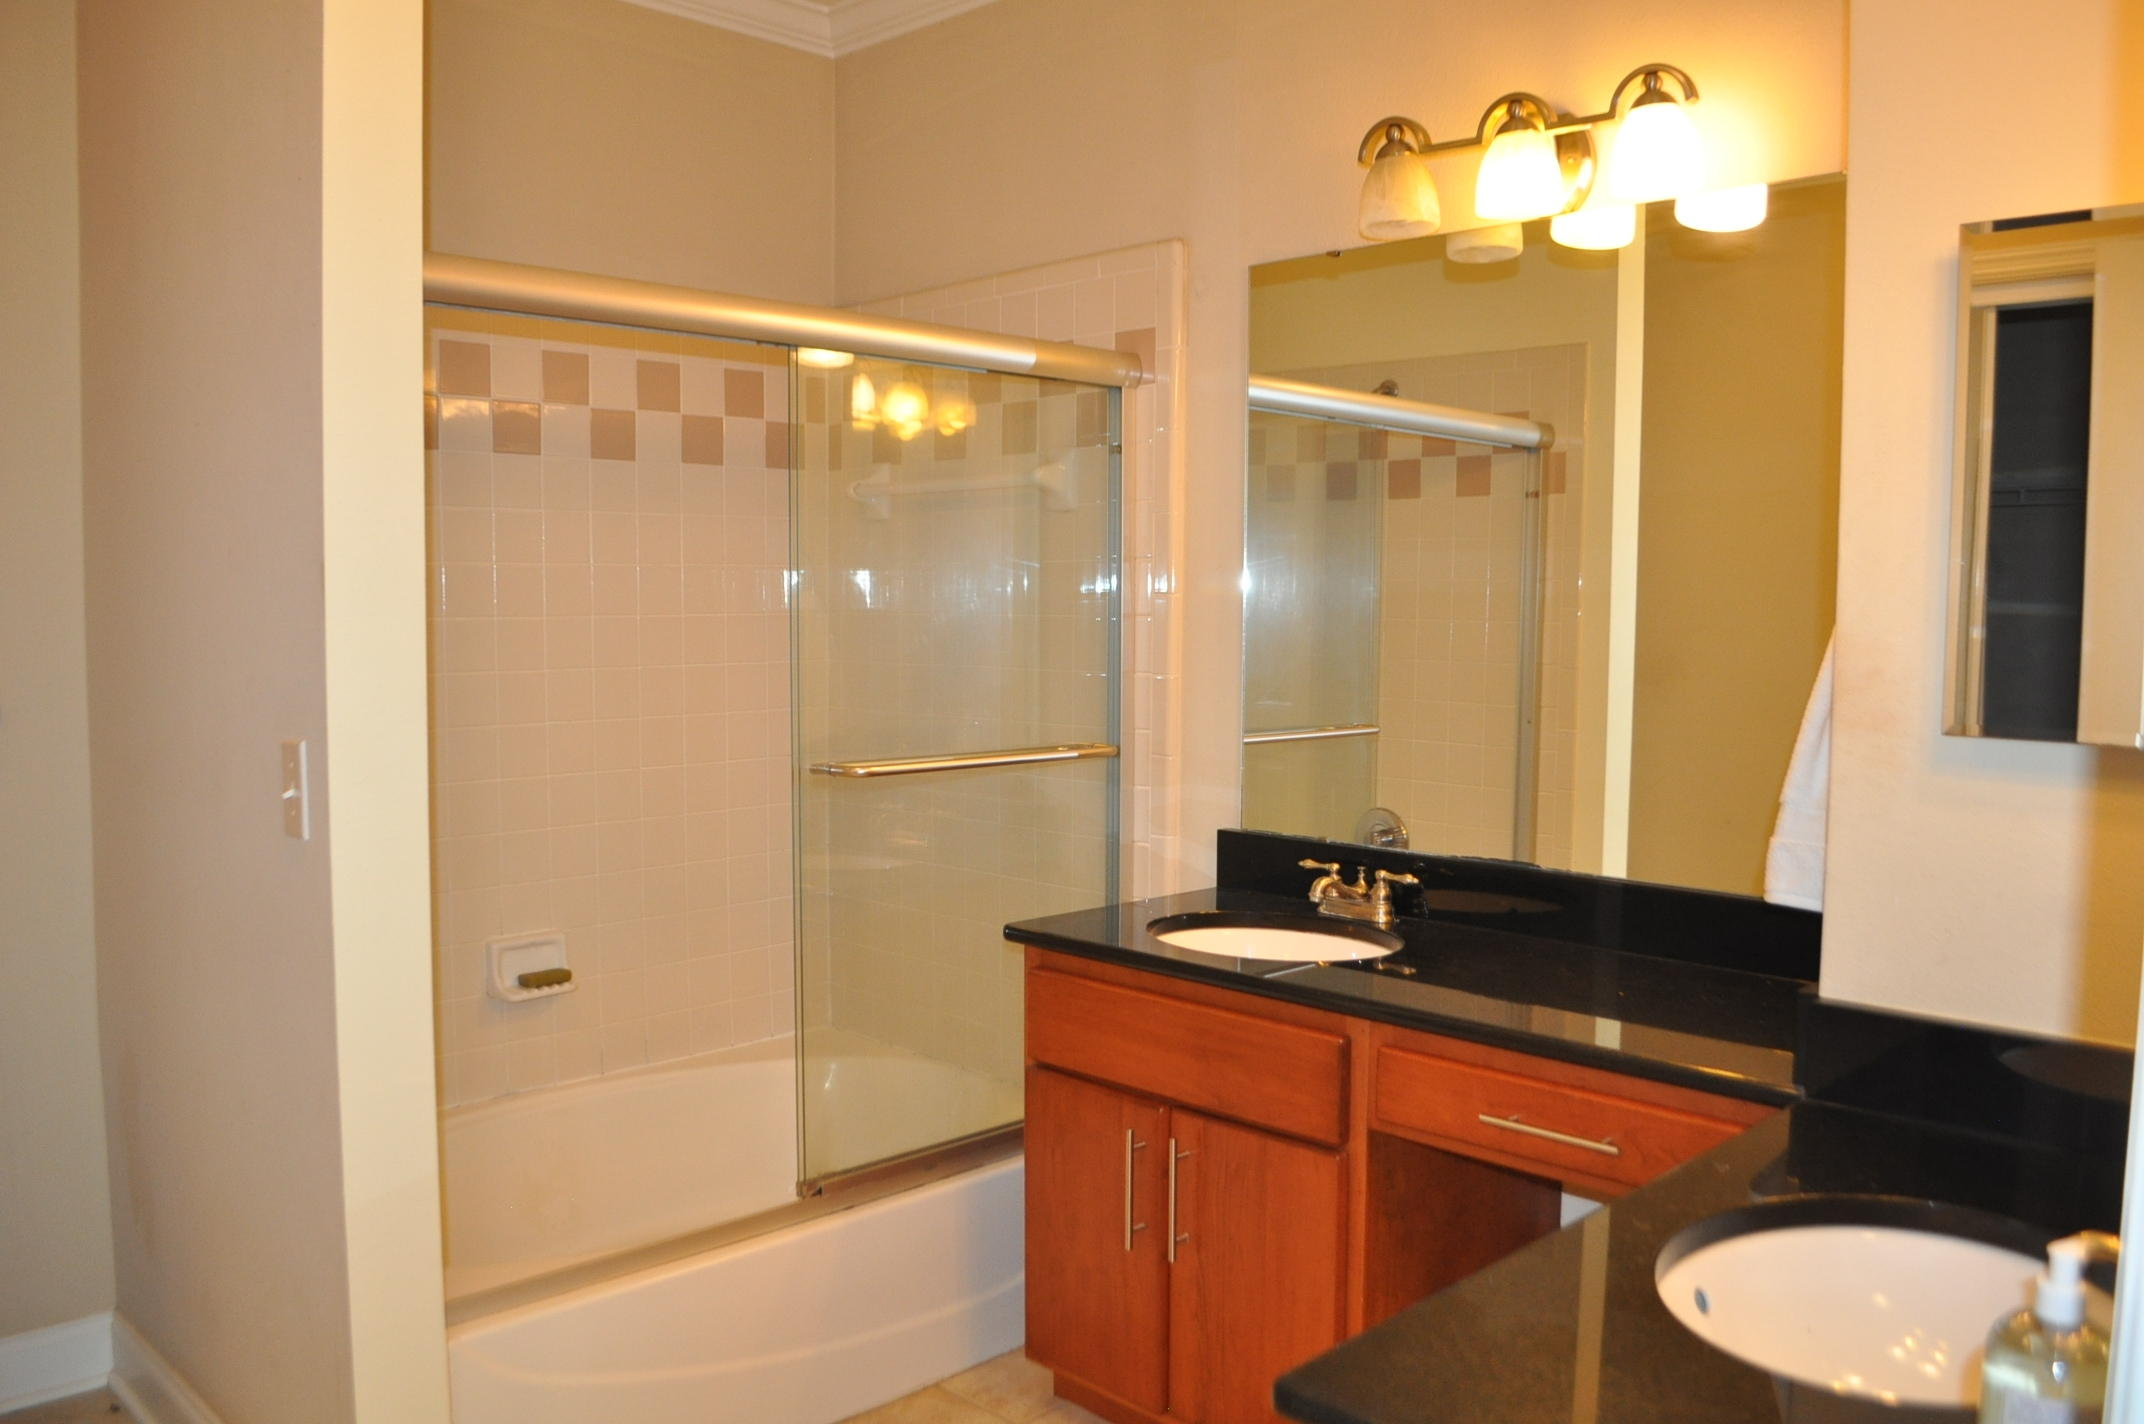 The Peninsula Condominiums Homes For Sale - 700 Daniel Ellis, Charleston, SC - 2